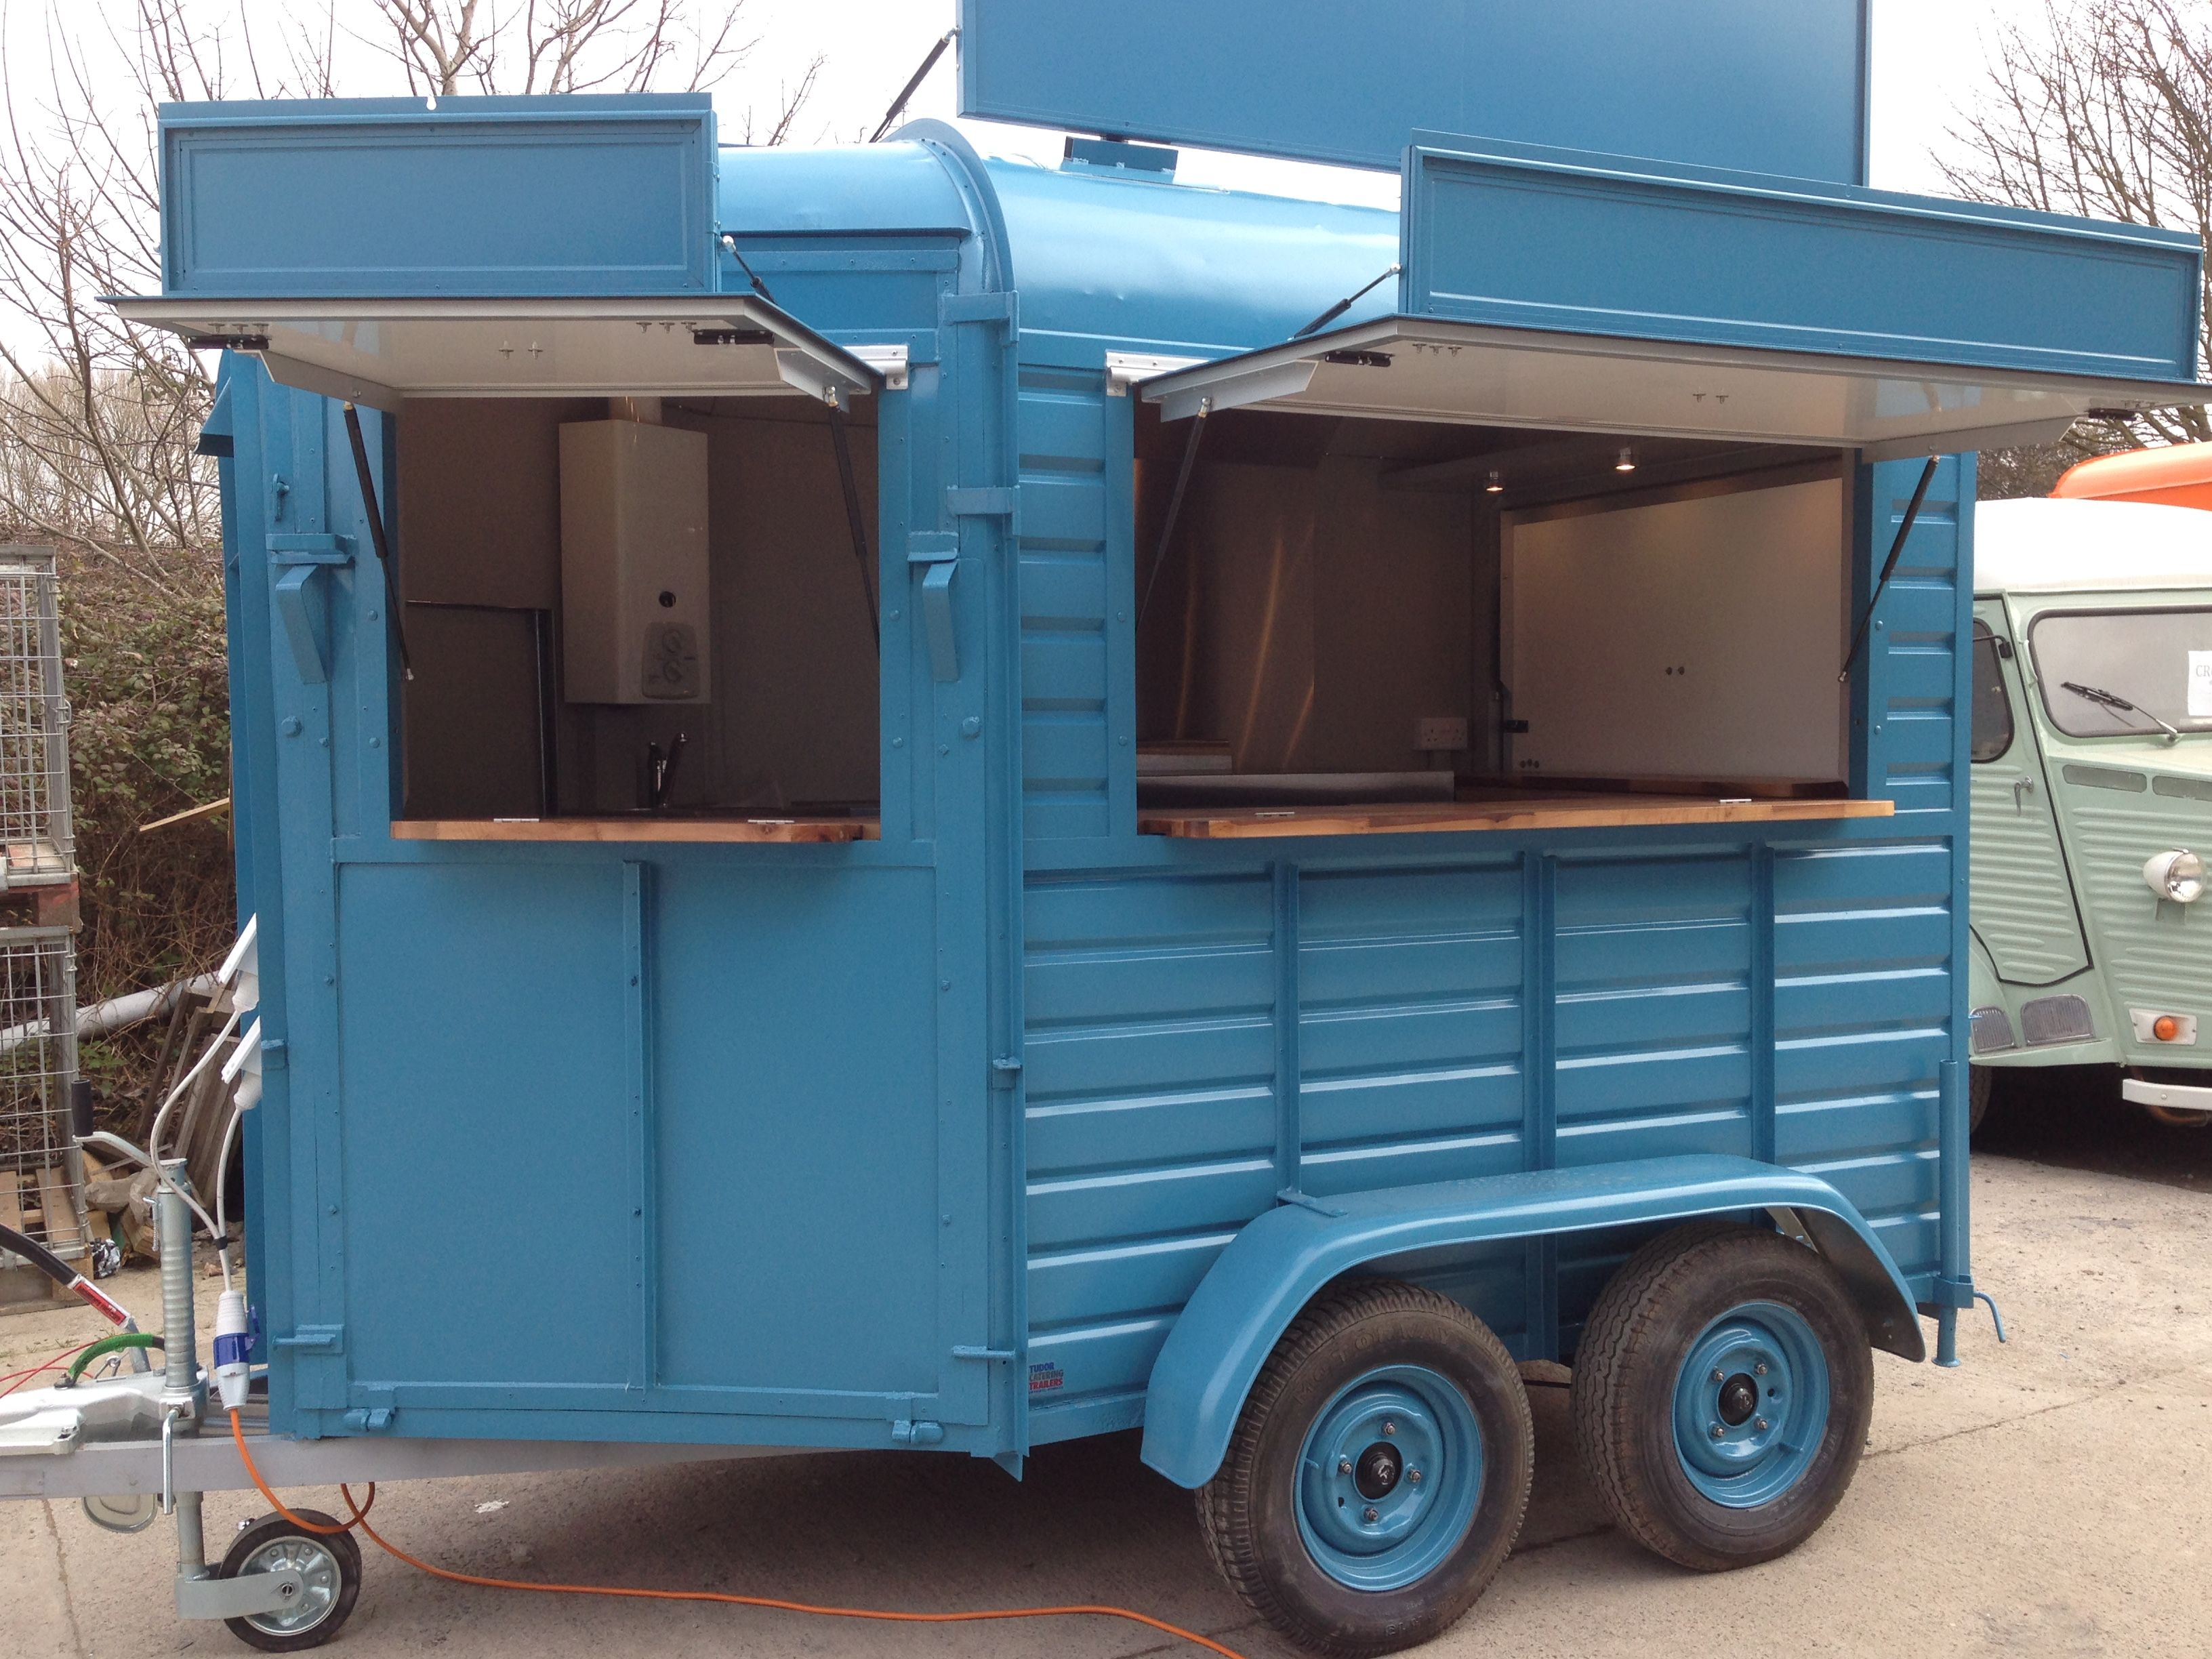 Horse Box Trailer | Horse Box Conversions | Pinterest | Food truck ...